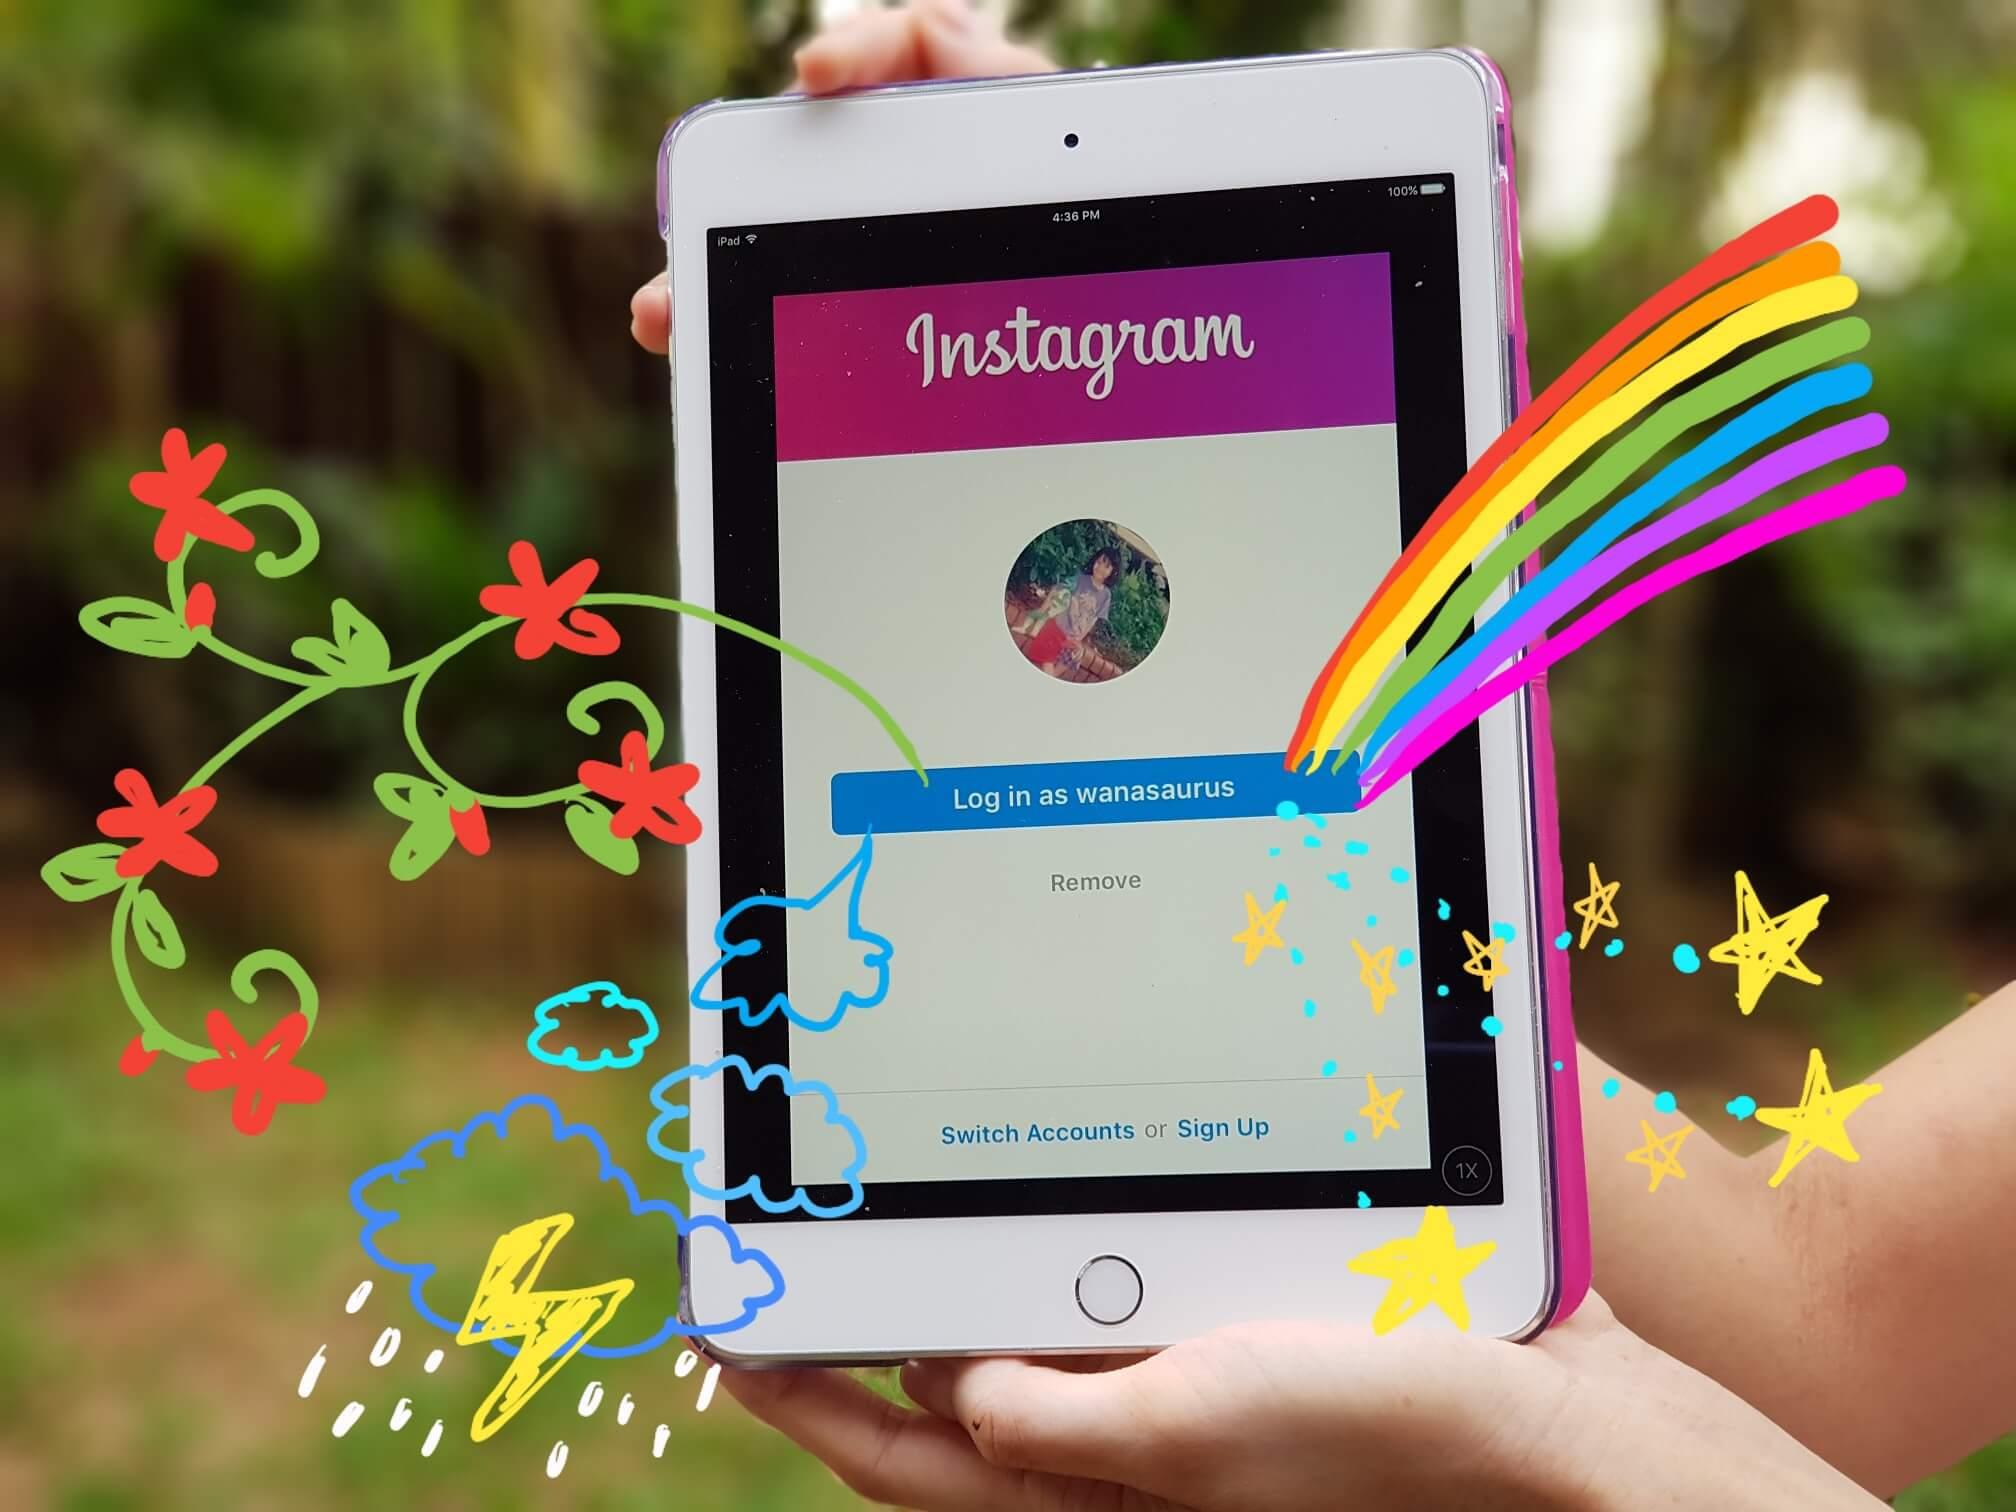 My Instagram workshop success story